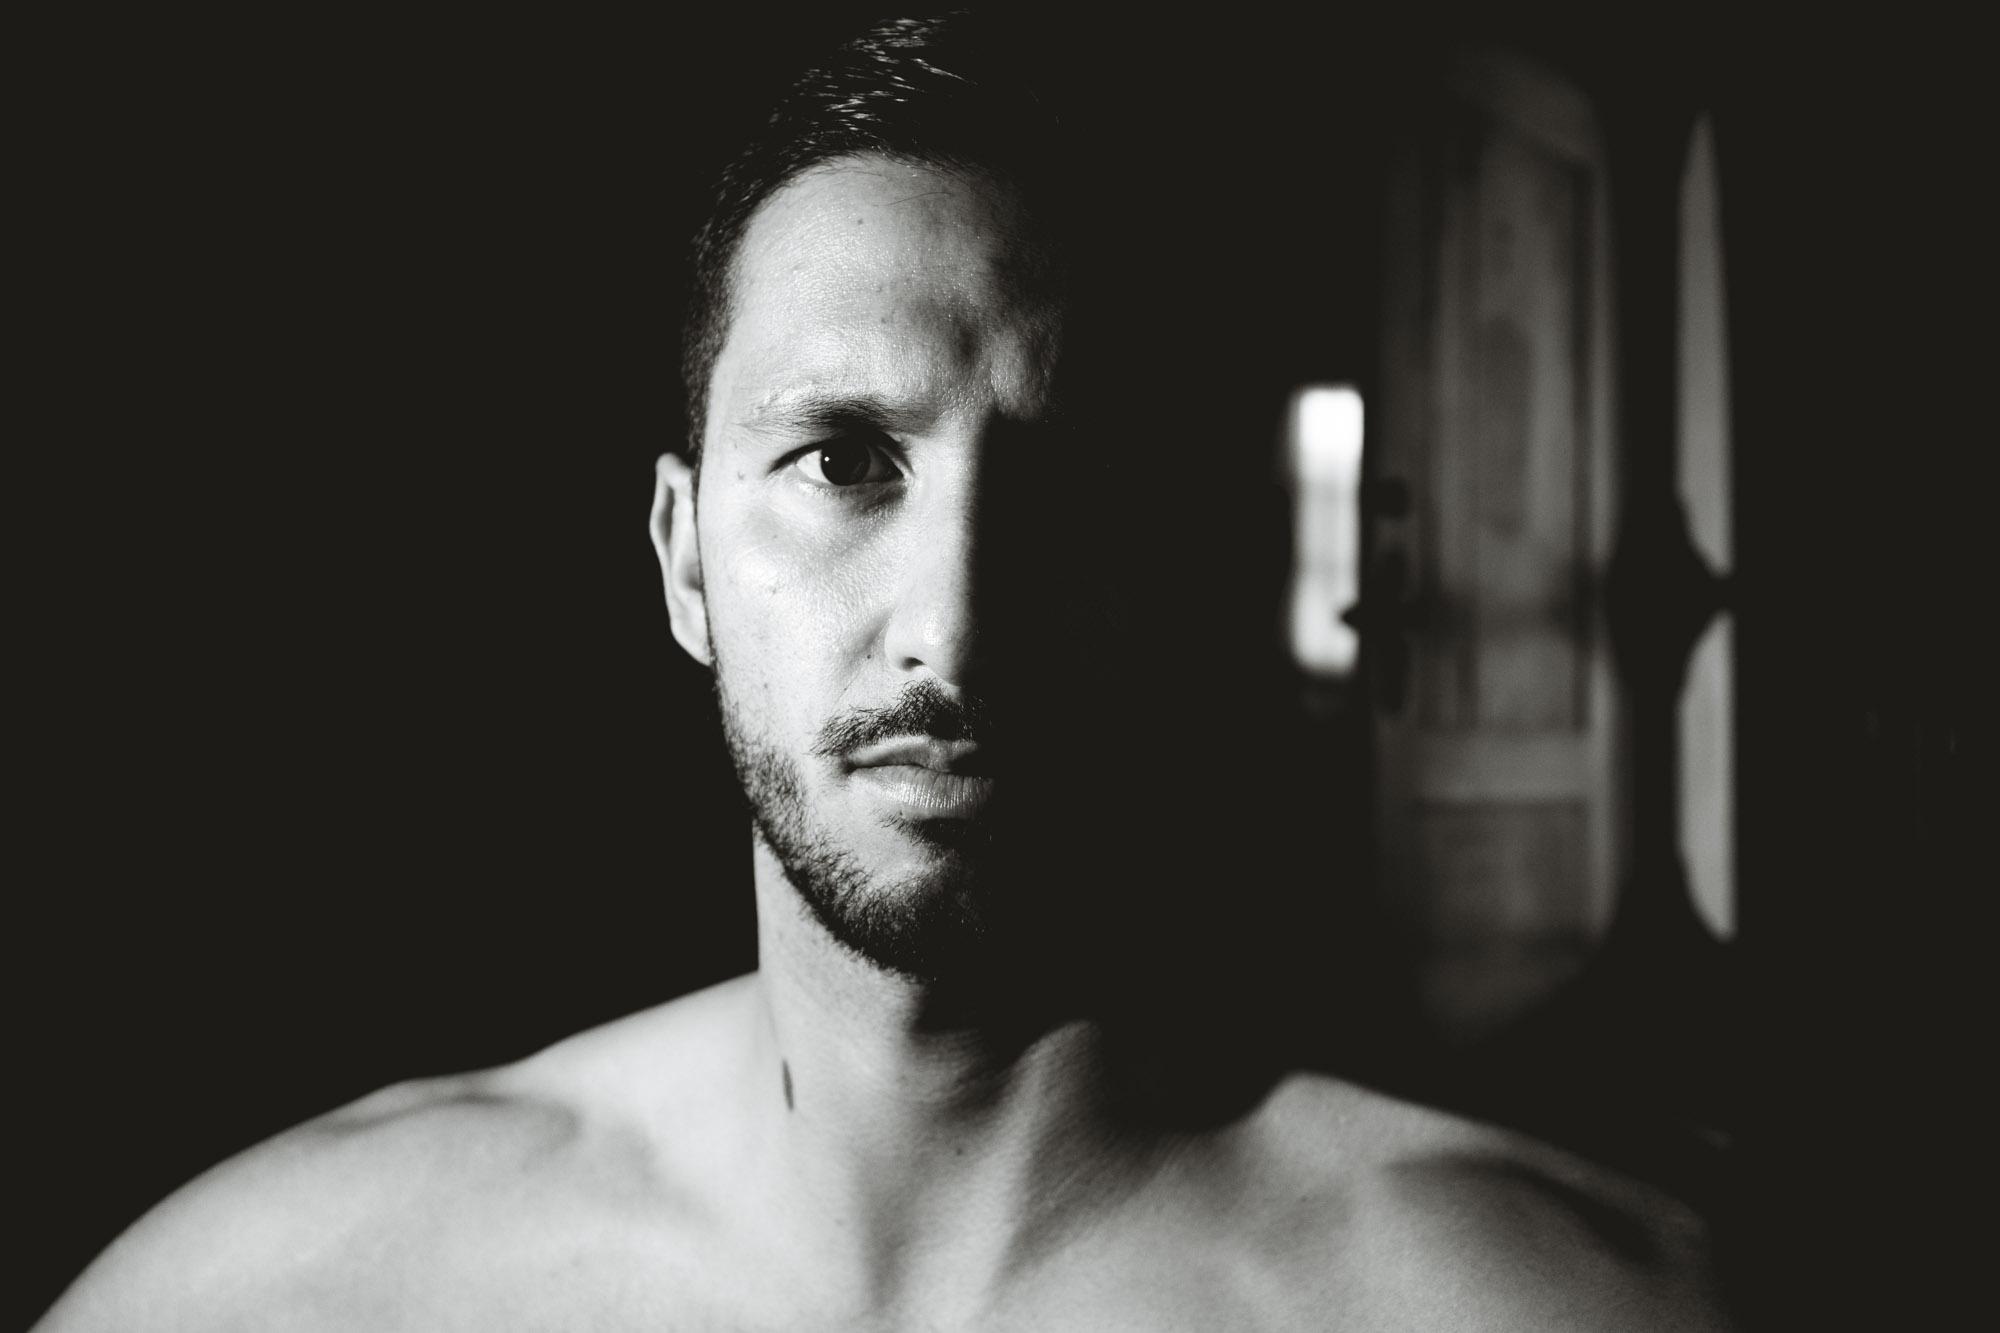 Daniel Meza Self Portrait